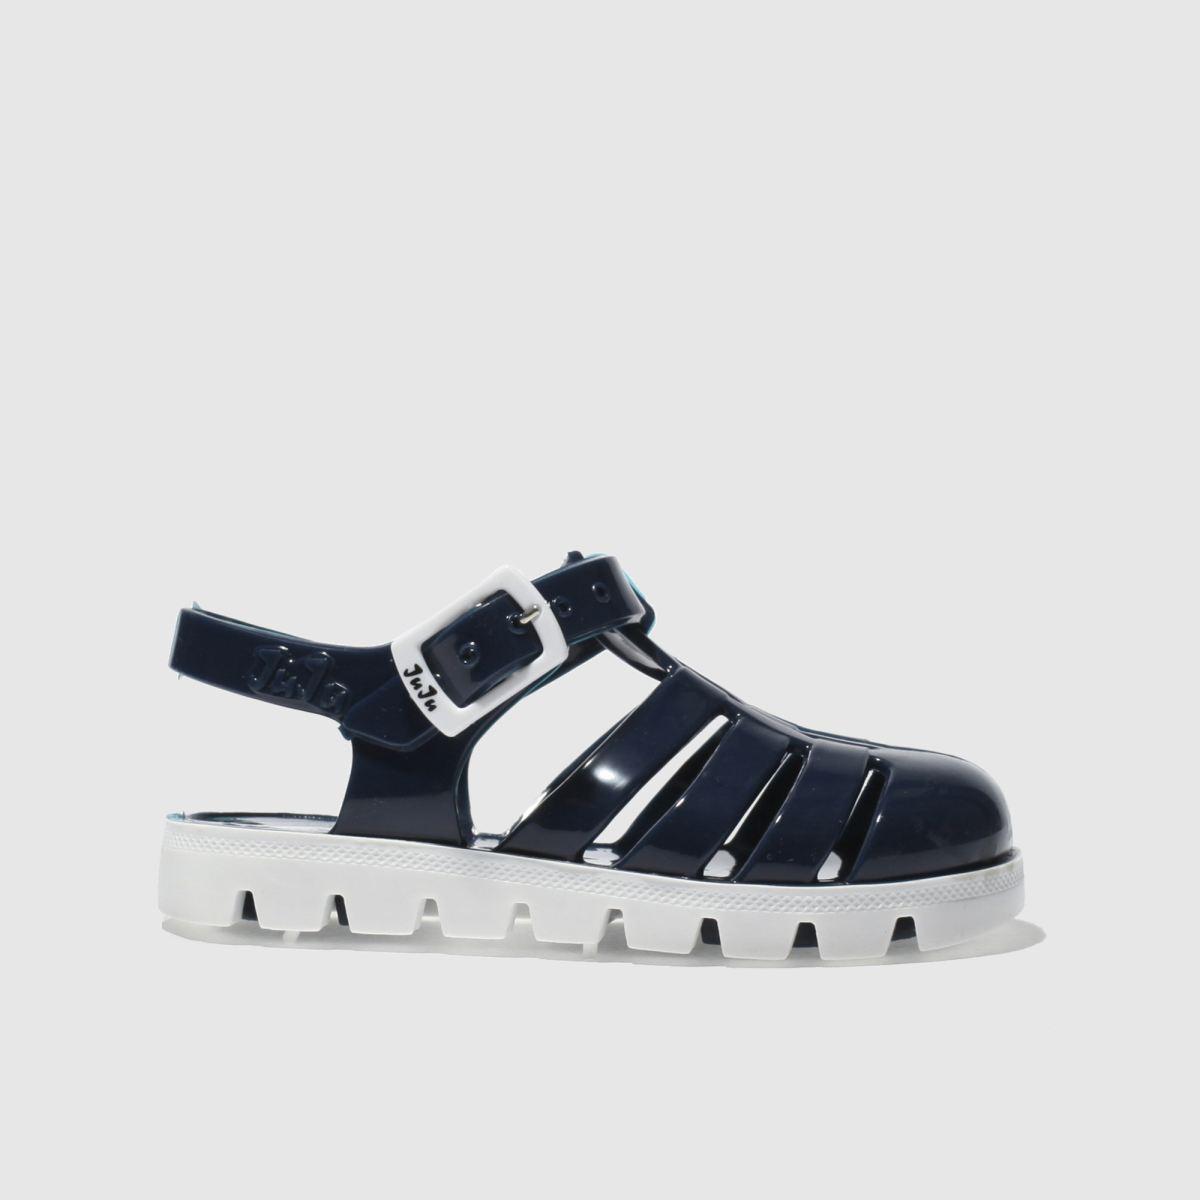 juju jellies Juju Jellies Navy Nino Boys Toddler Sandals